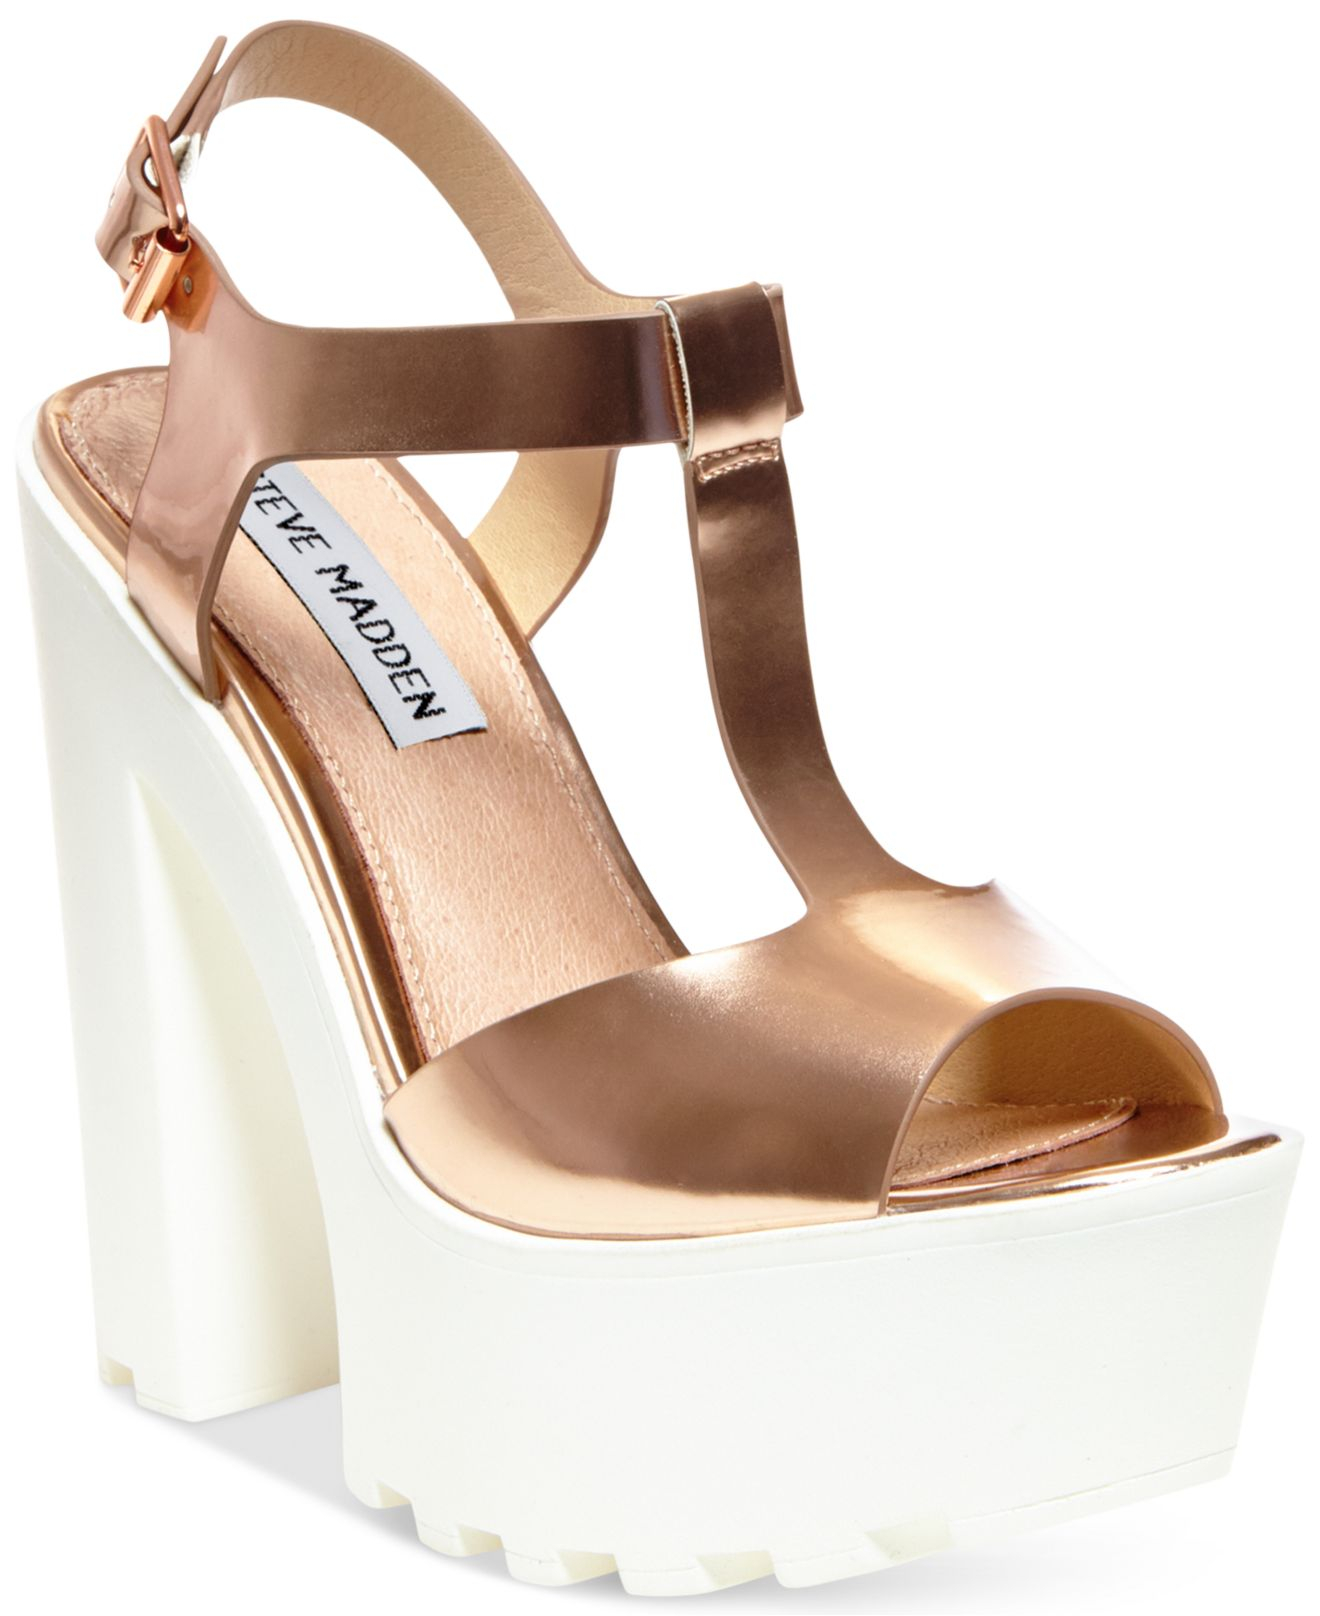 47d6e88ac3a8b Steve Madden Stecy rose gold heel sandal size 8 5 Source · Lyst Steve Madden  Girltalk Platform Wedge Sandals in Pink